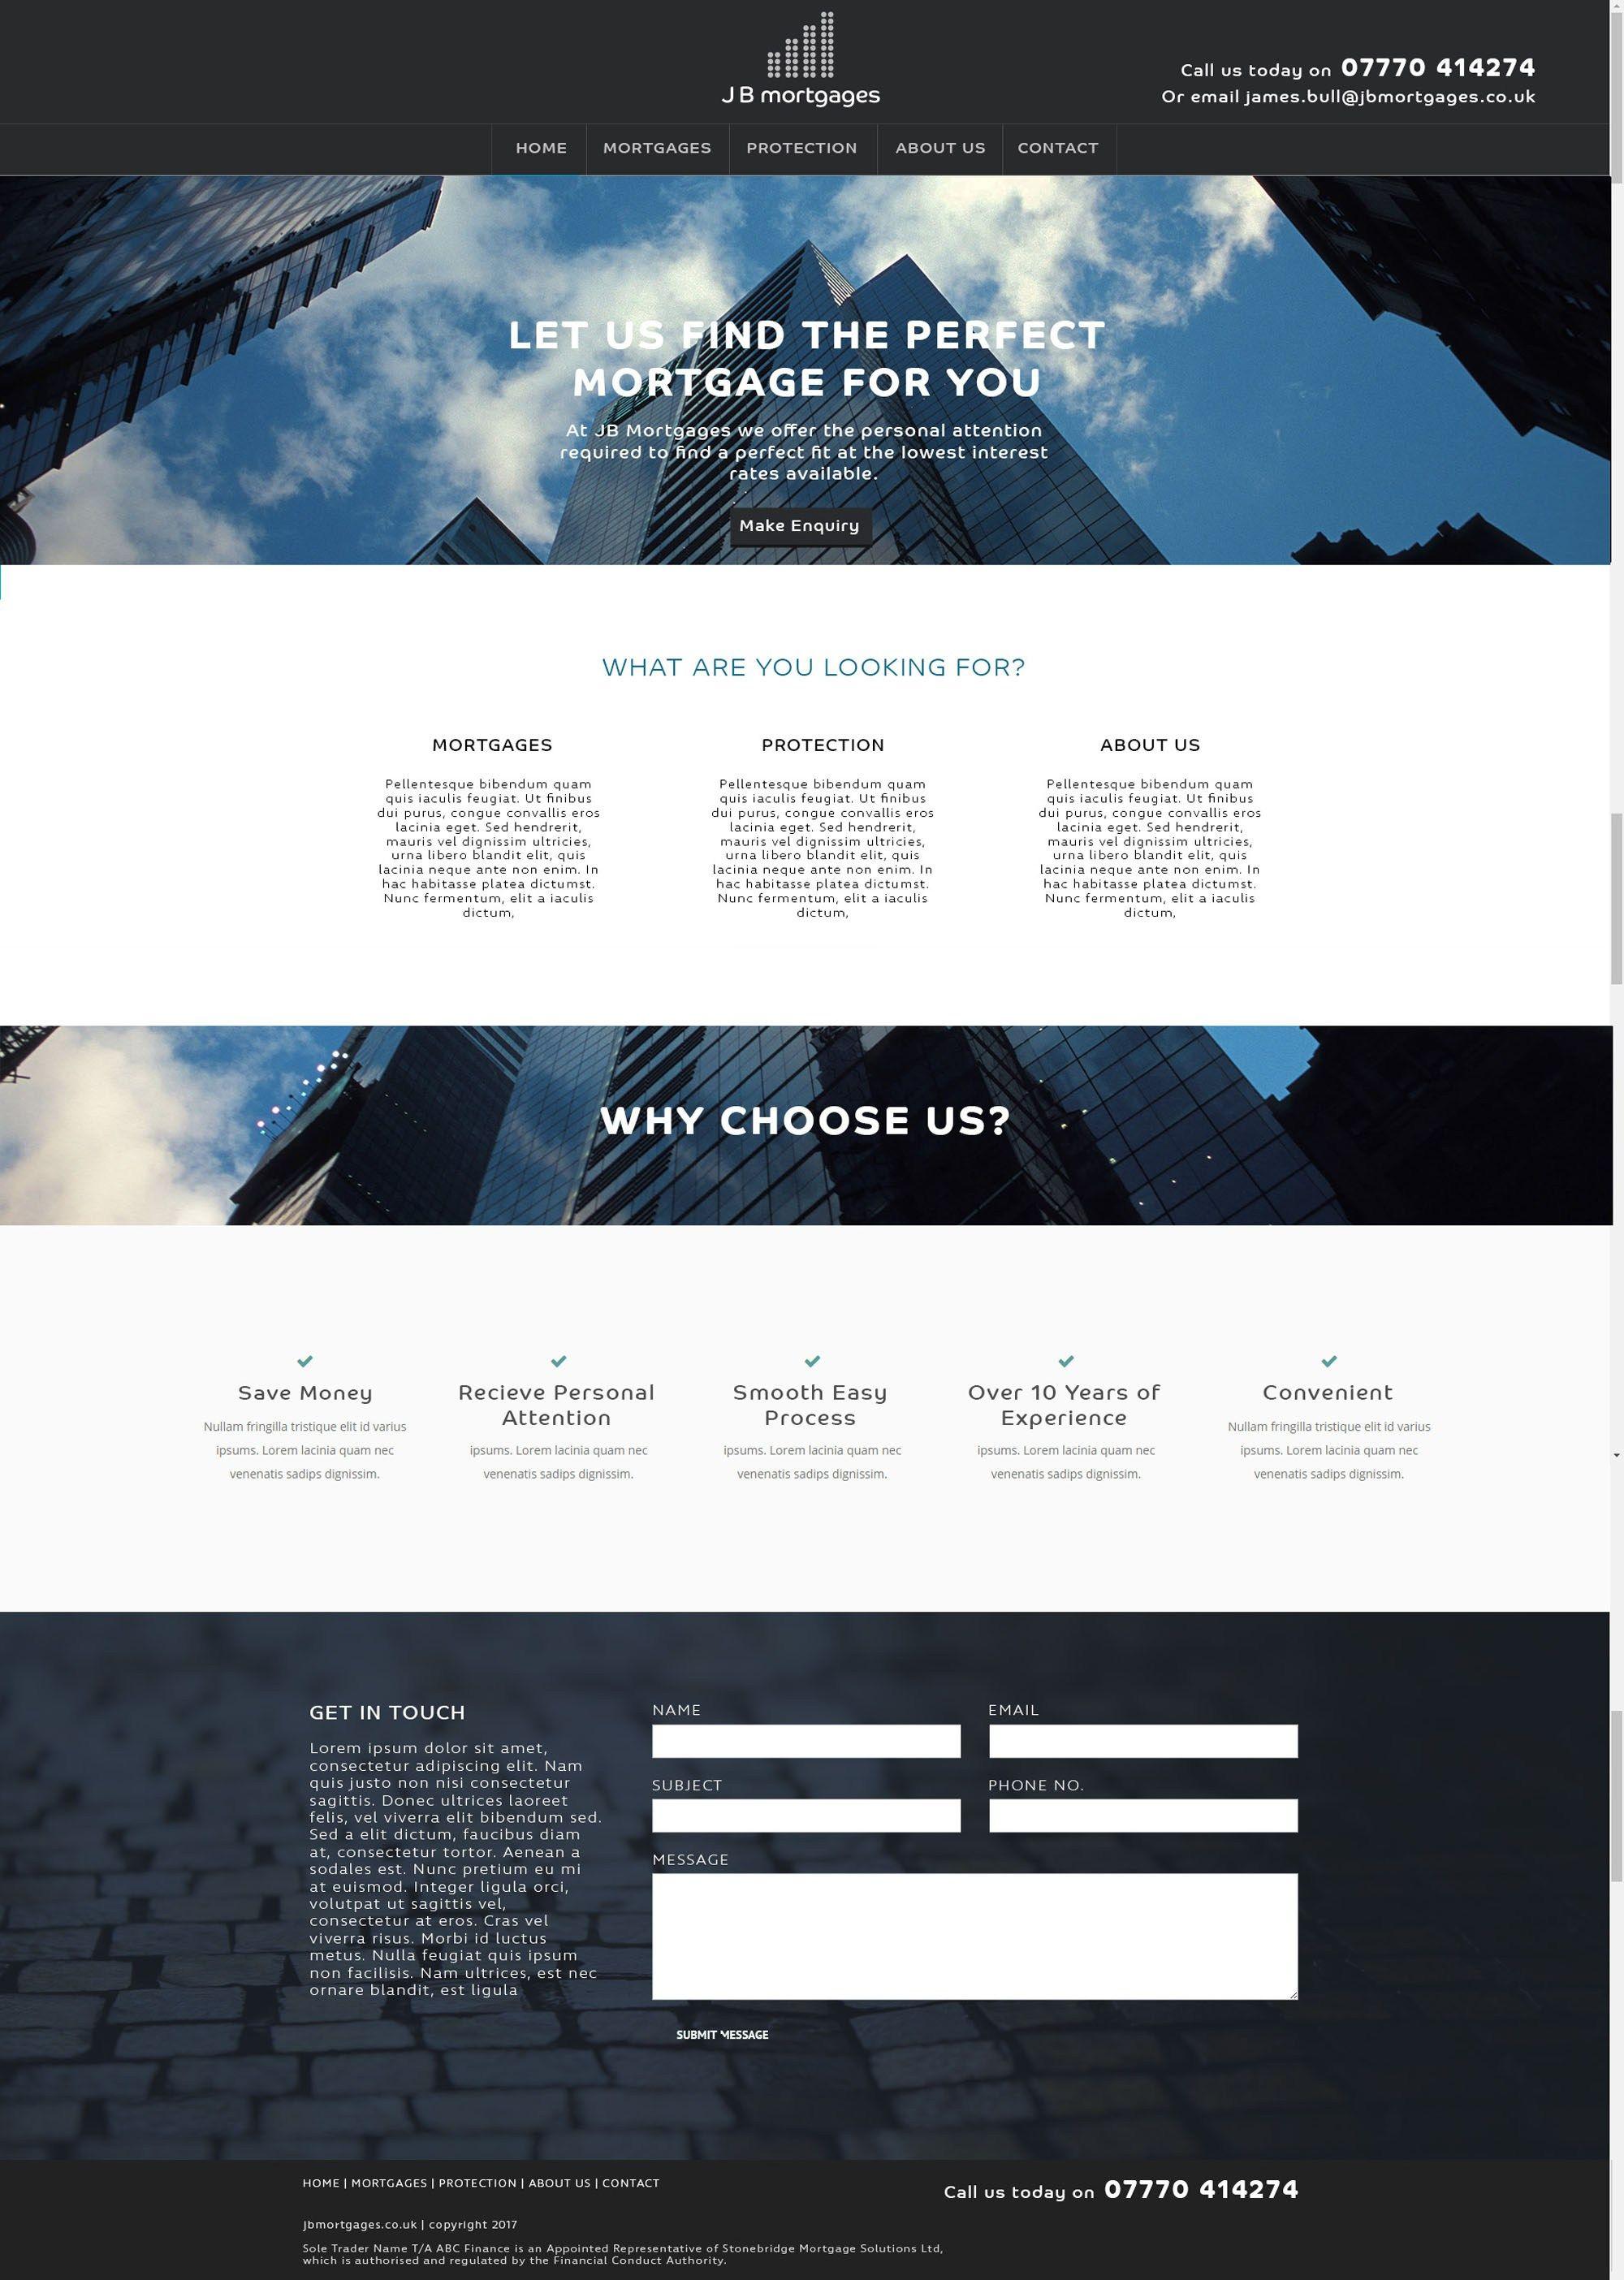 Jb Mortgages Website Design Development London Enfield Web Design London